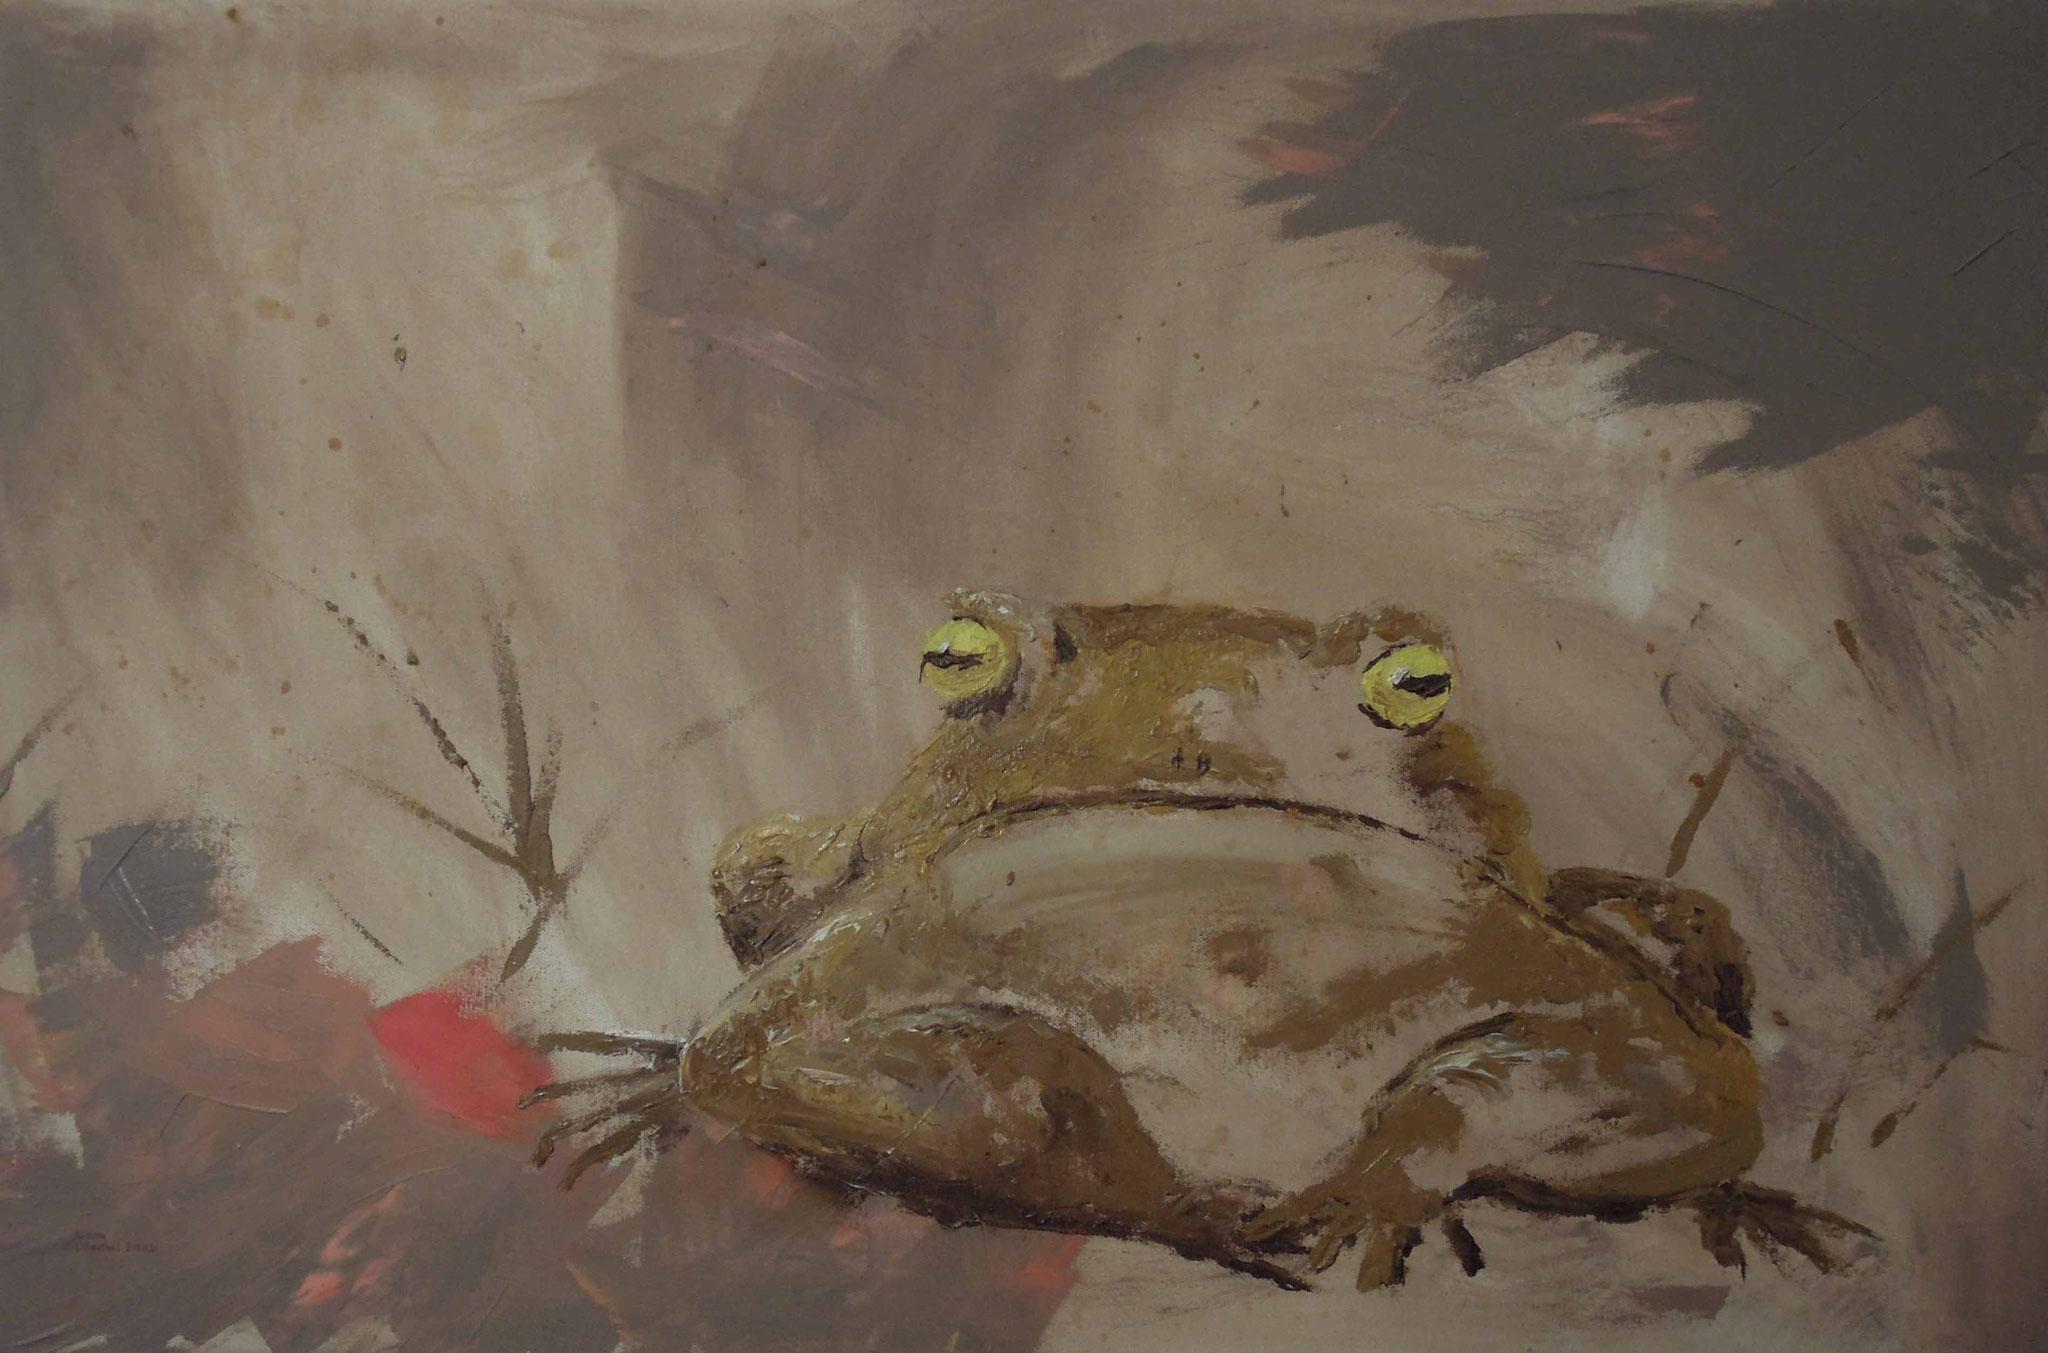 Kröte - Öl auf Leinwand 90 x 60 cm